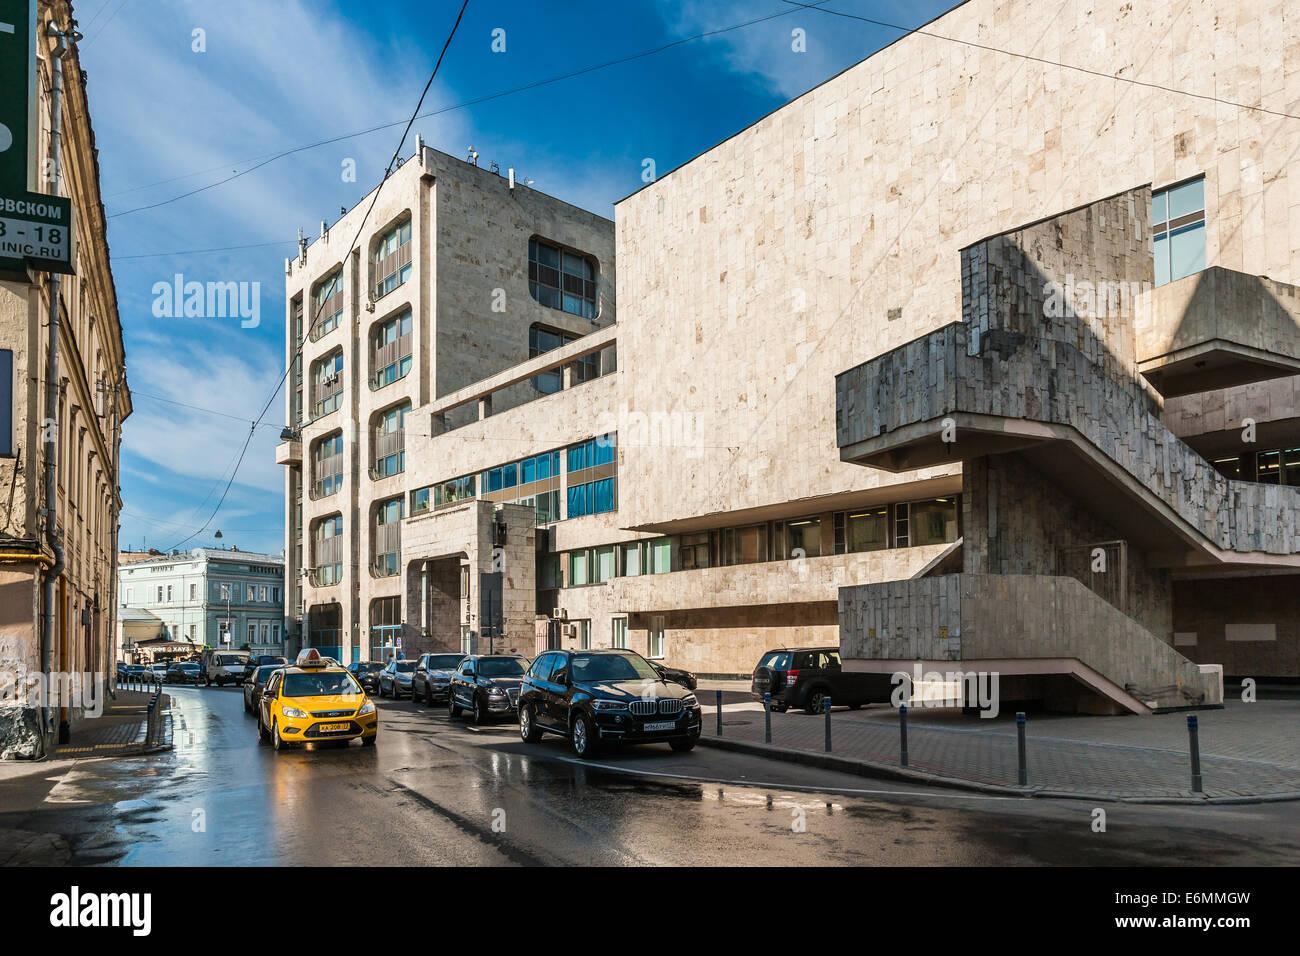 Russian Information News Agency ITAR-TASS building - Stock Image